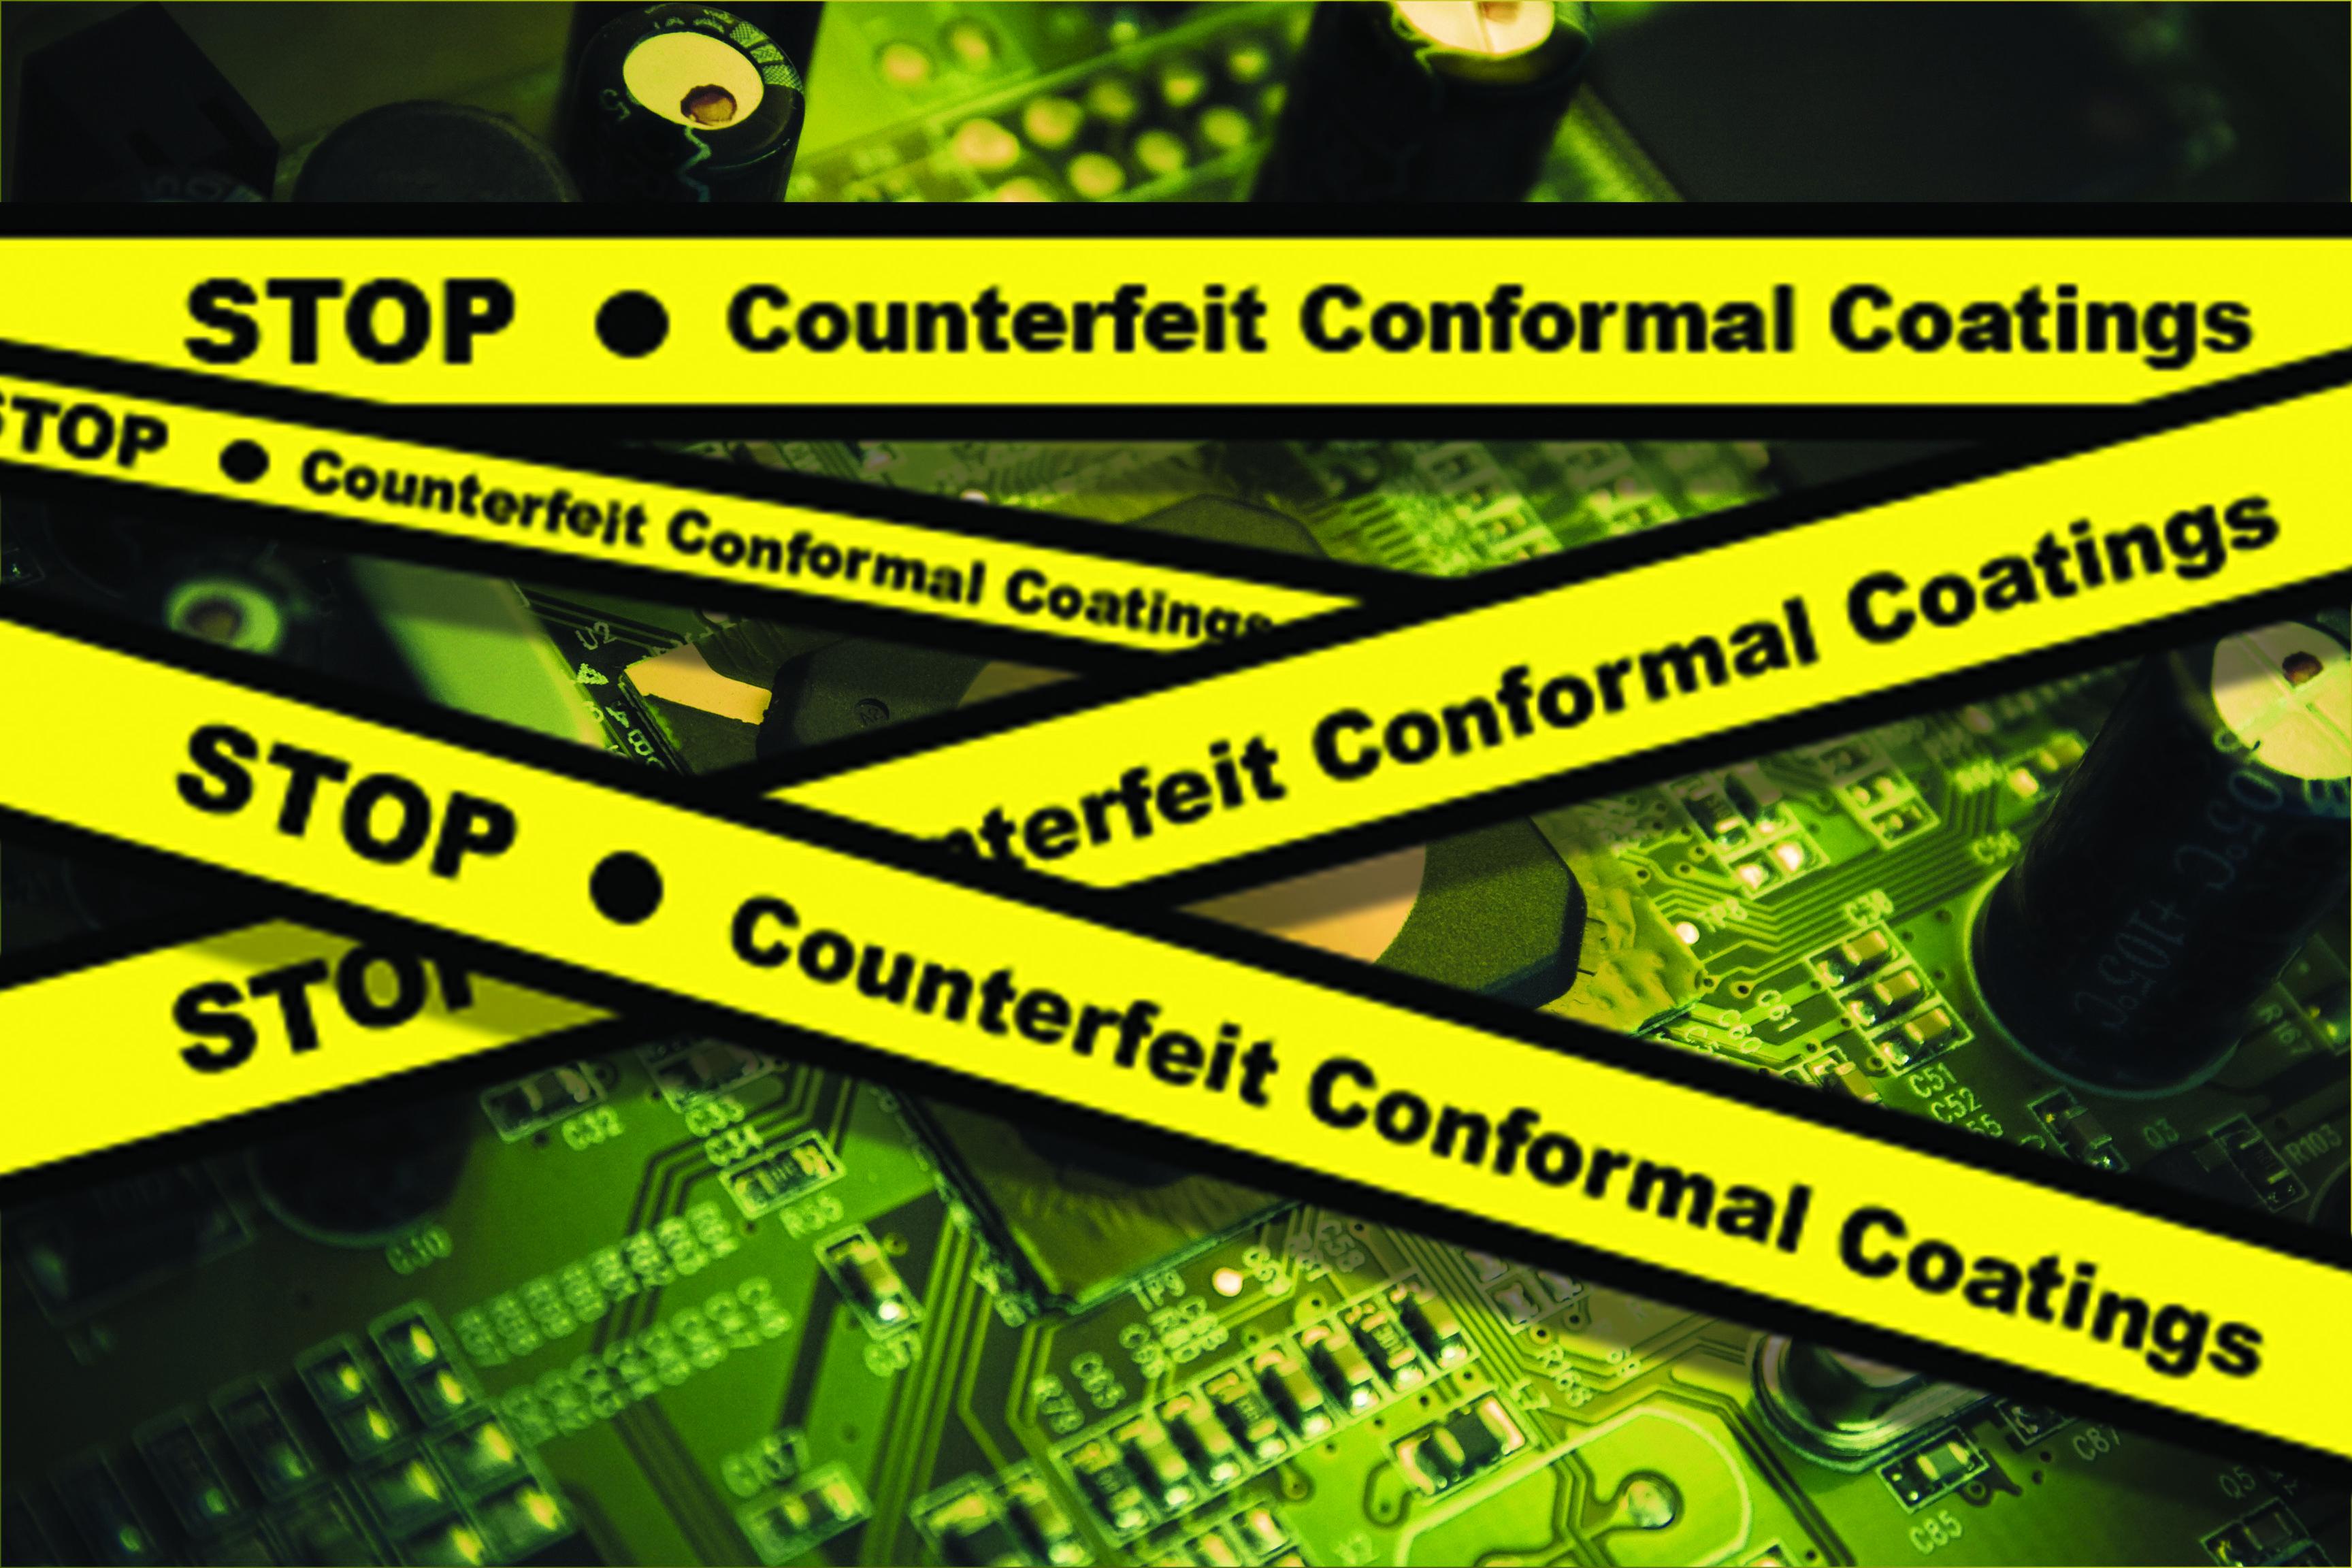 Counterfeit conformal coatings.jpg